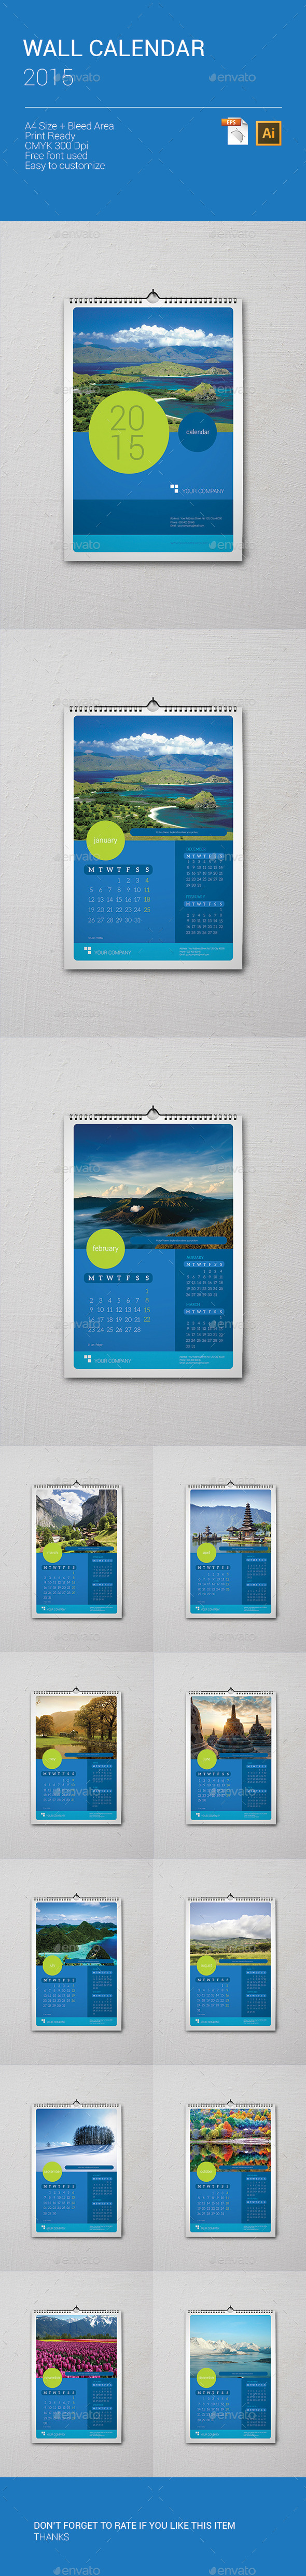 Wall Calendar 2015 - Calendars Stationery